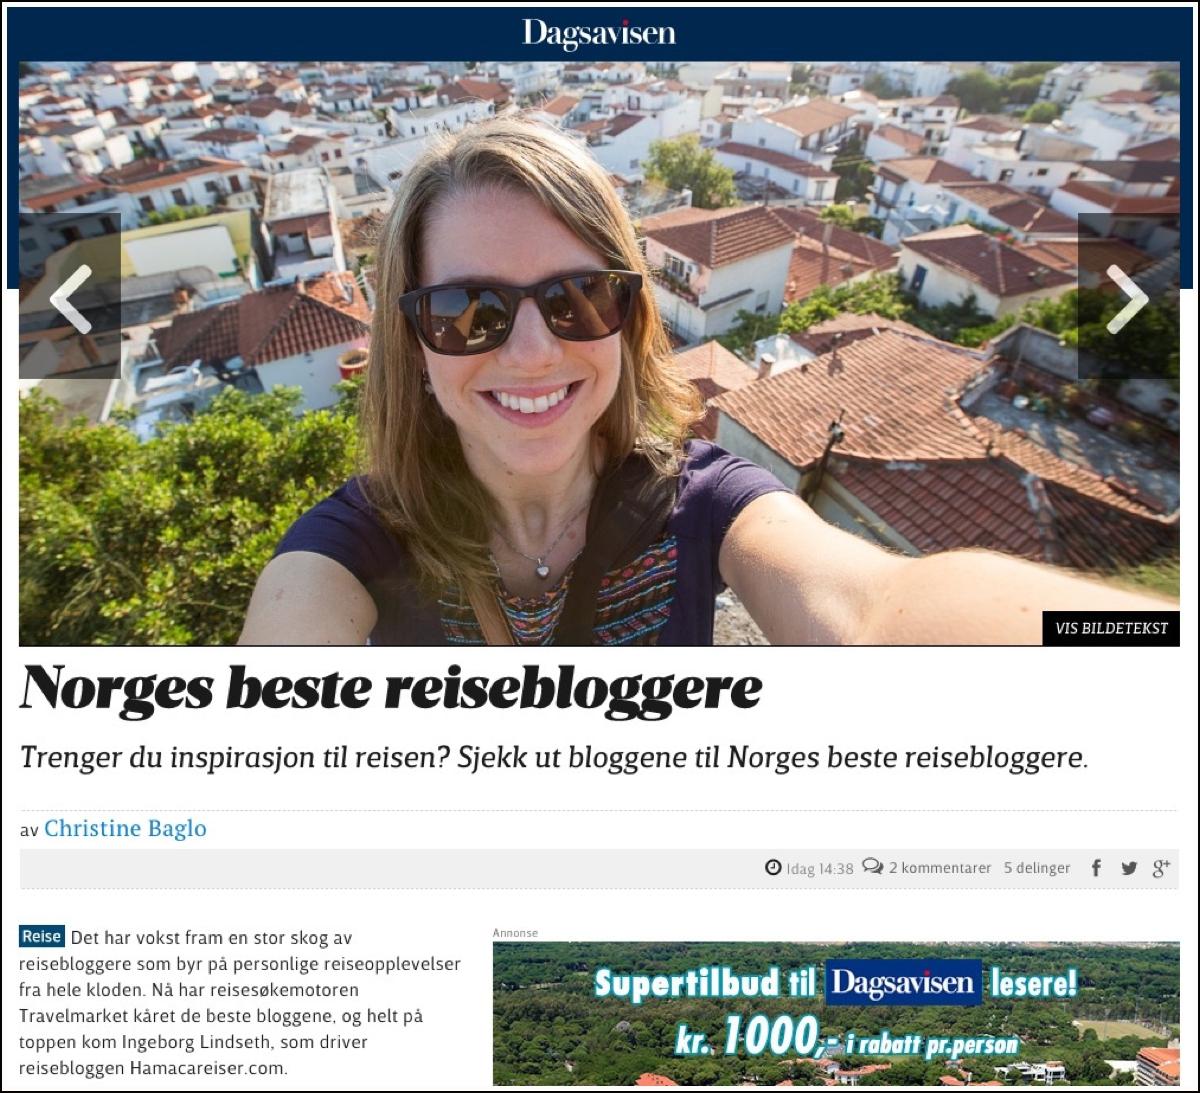 hamaca-reiseblogg-i-dagsavisen